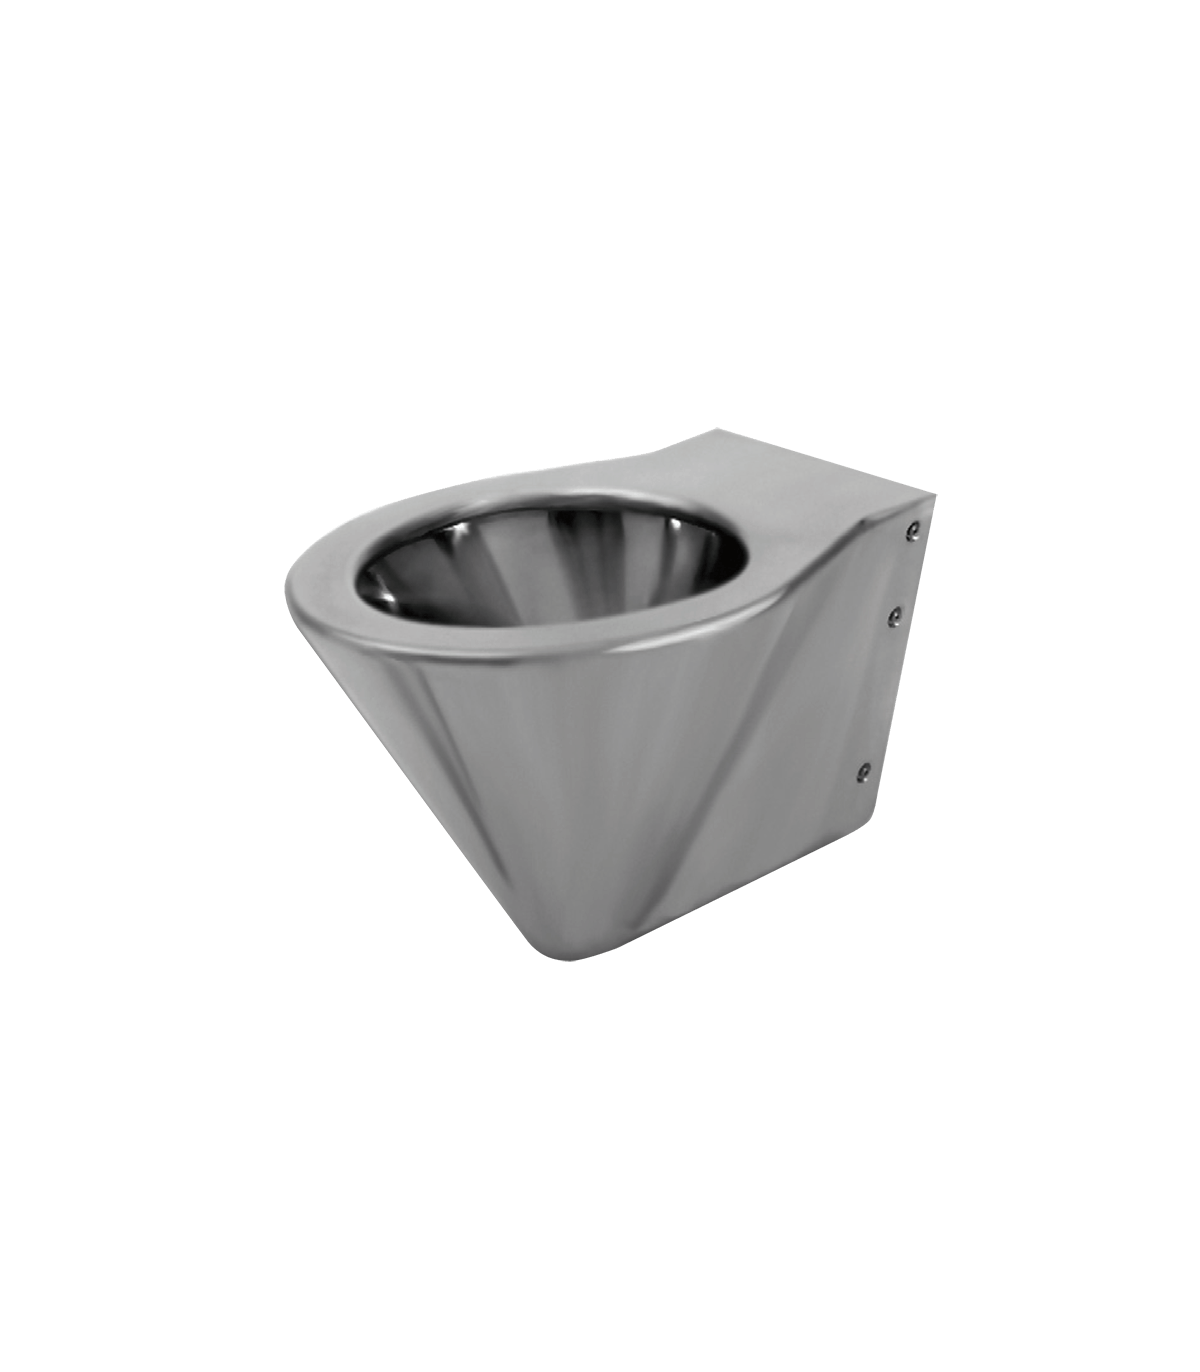 Marque De Toilette Suspendue cuvette wc suspendue